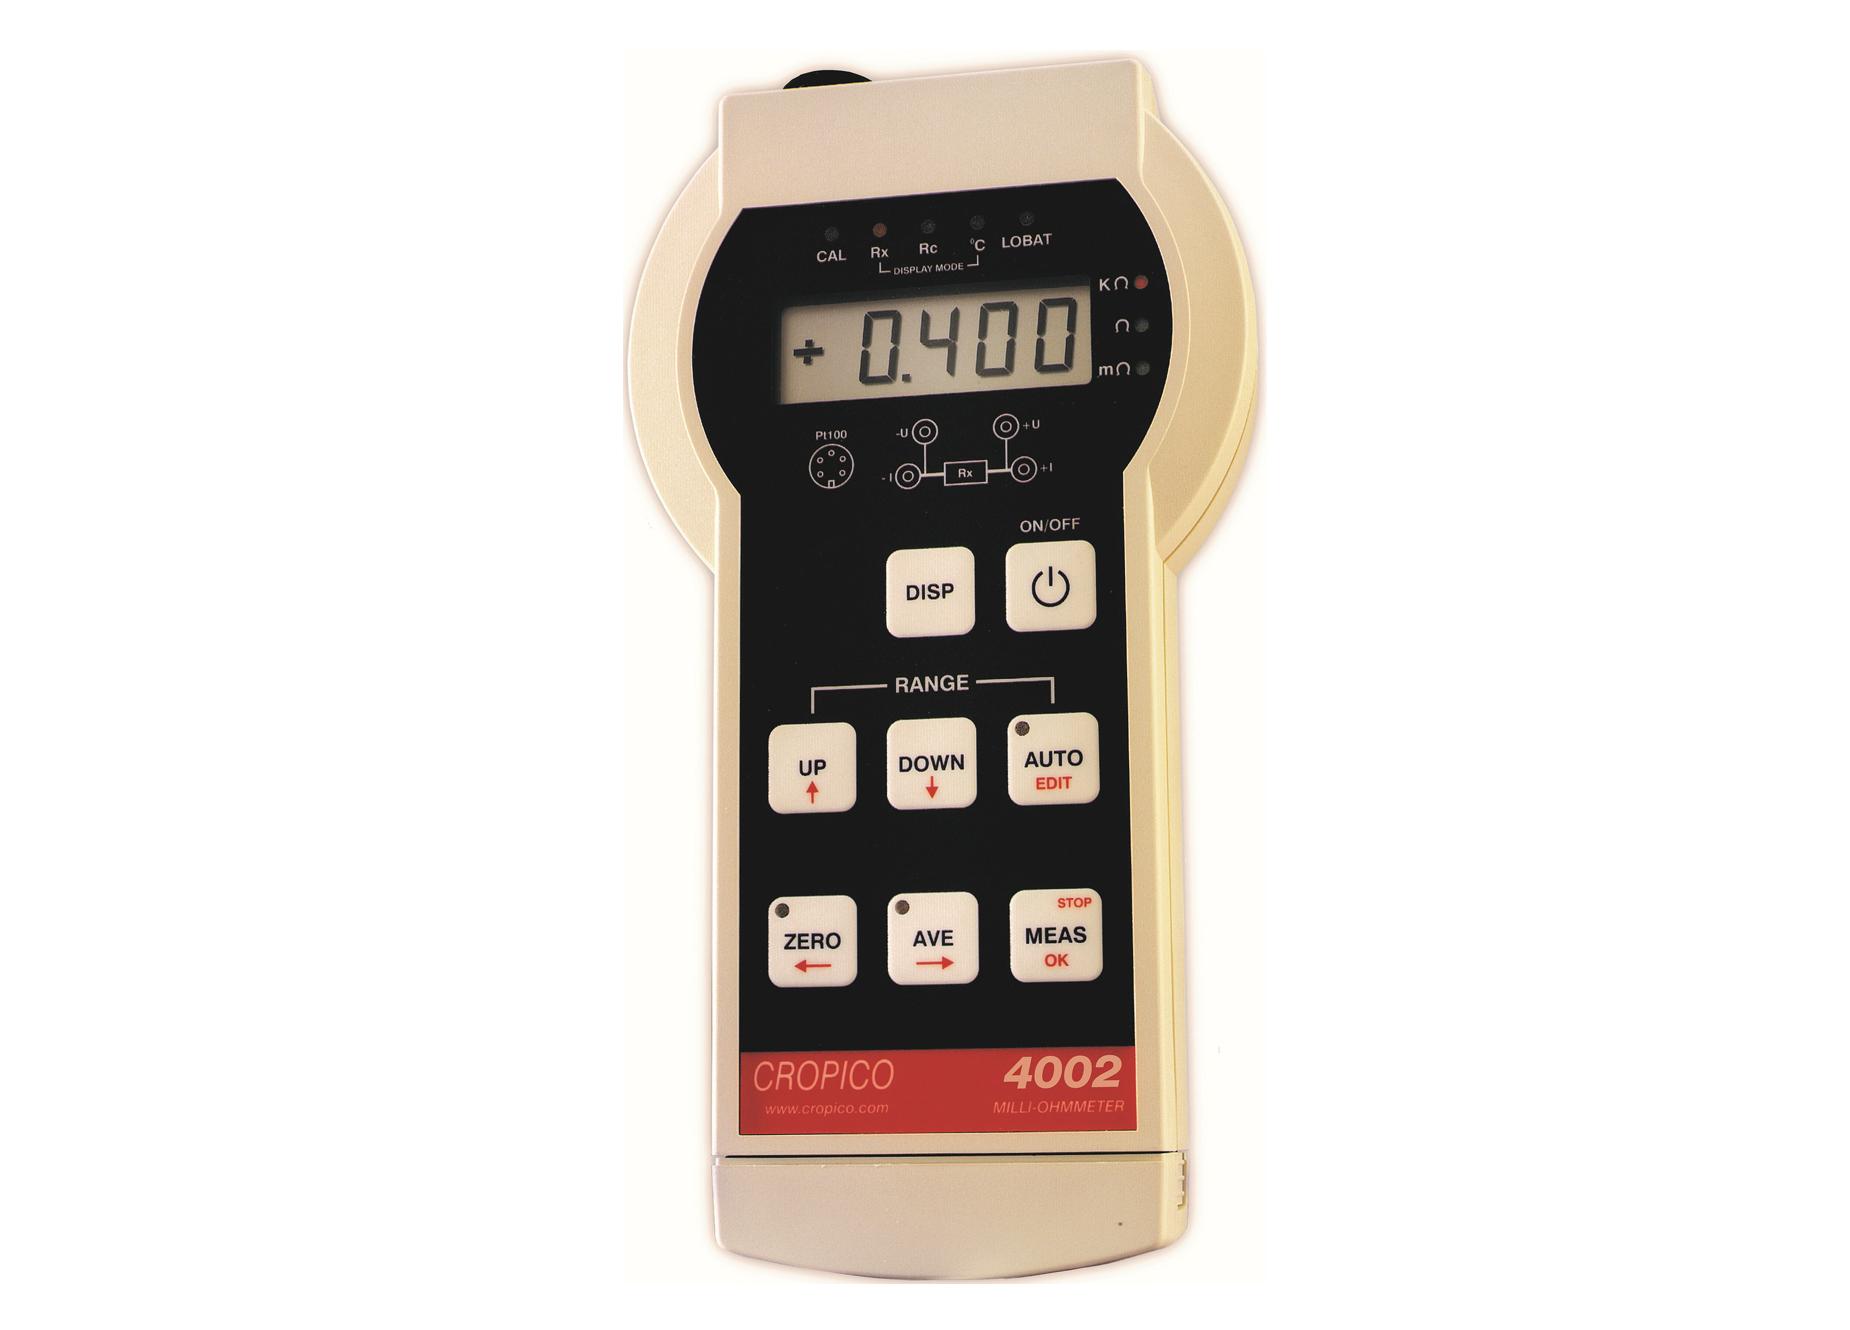 Cropico DO4000 series milliOhmmeter